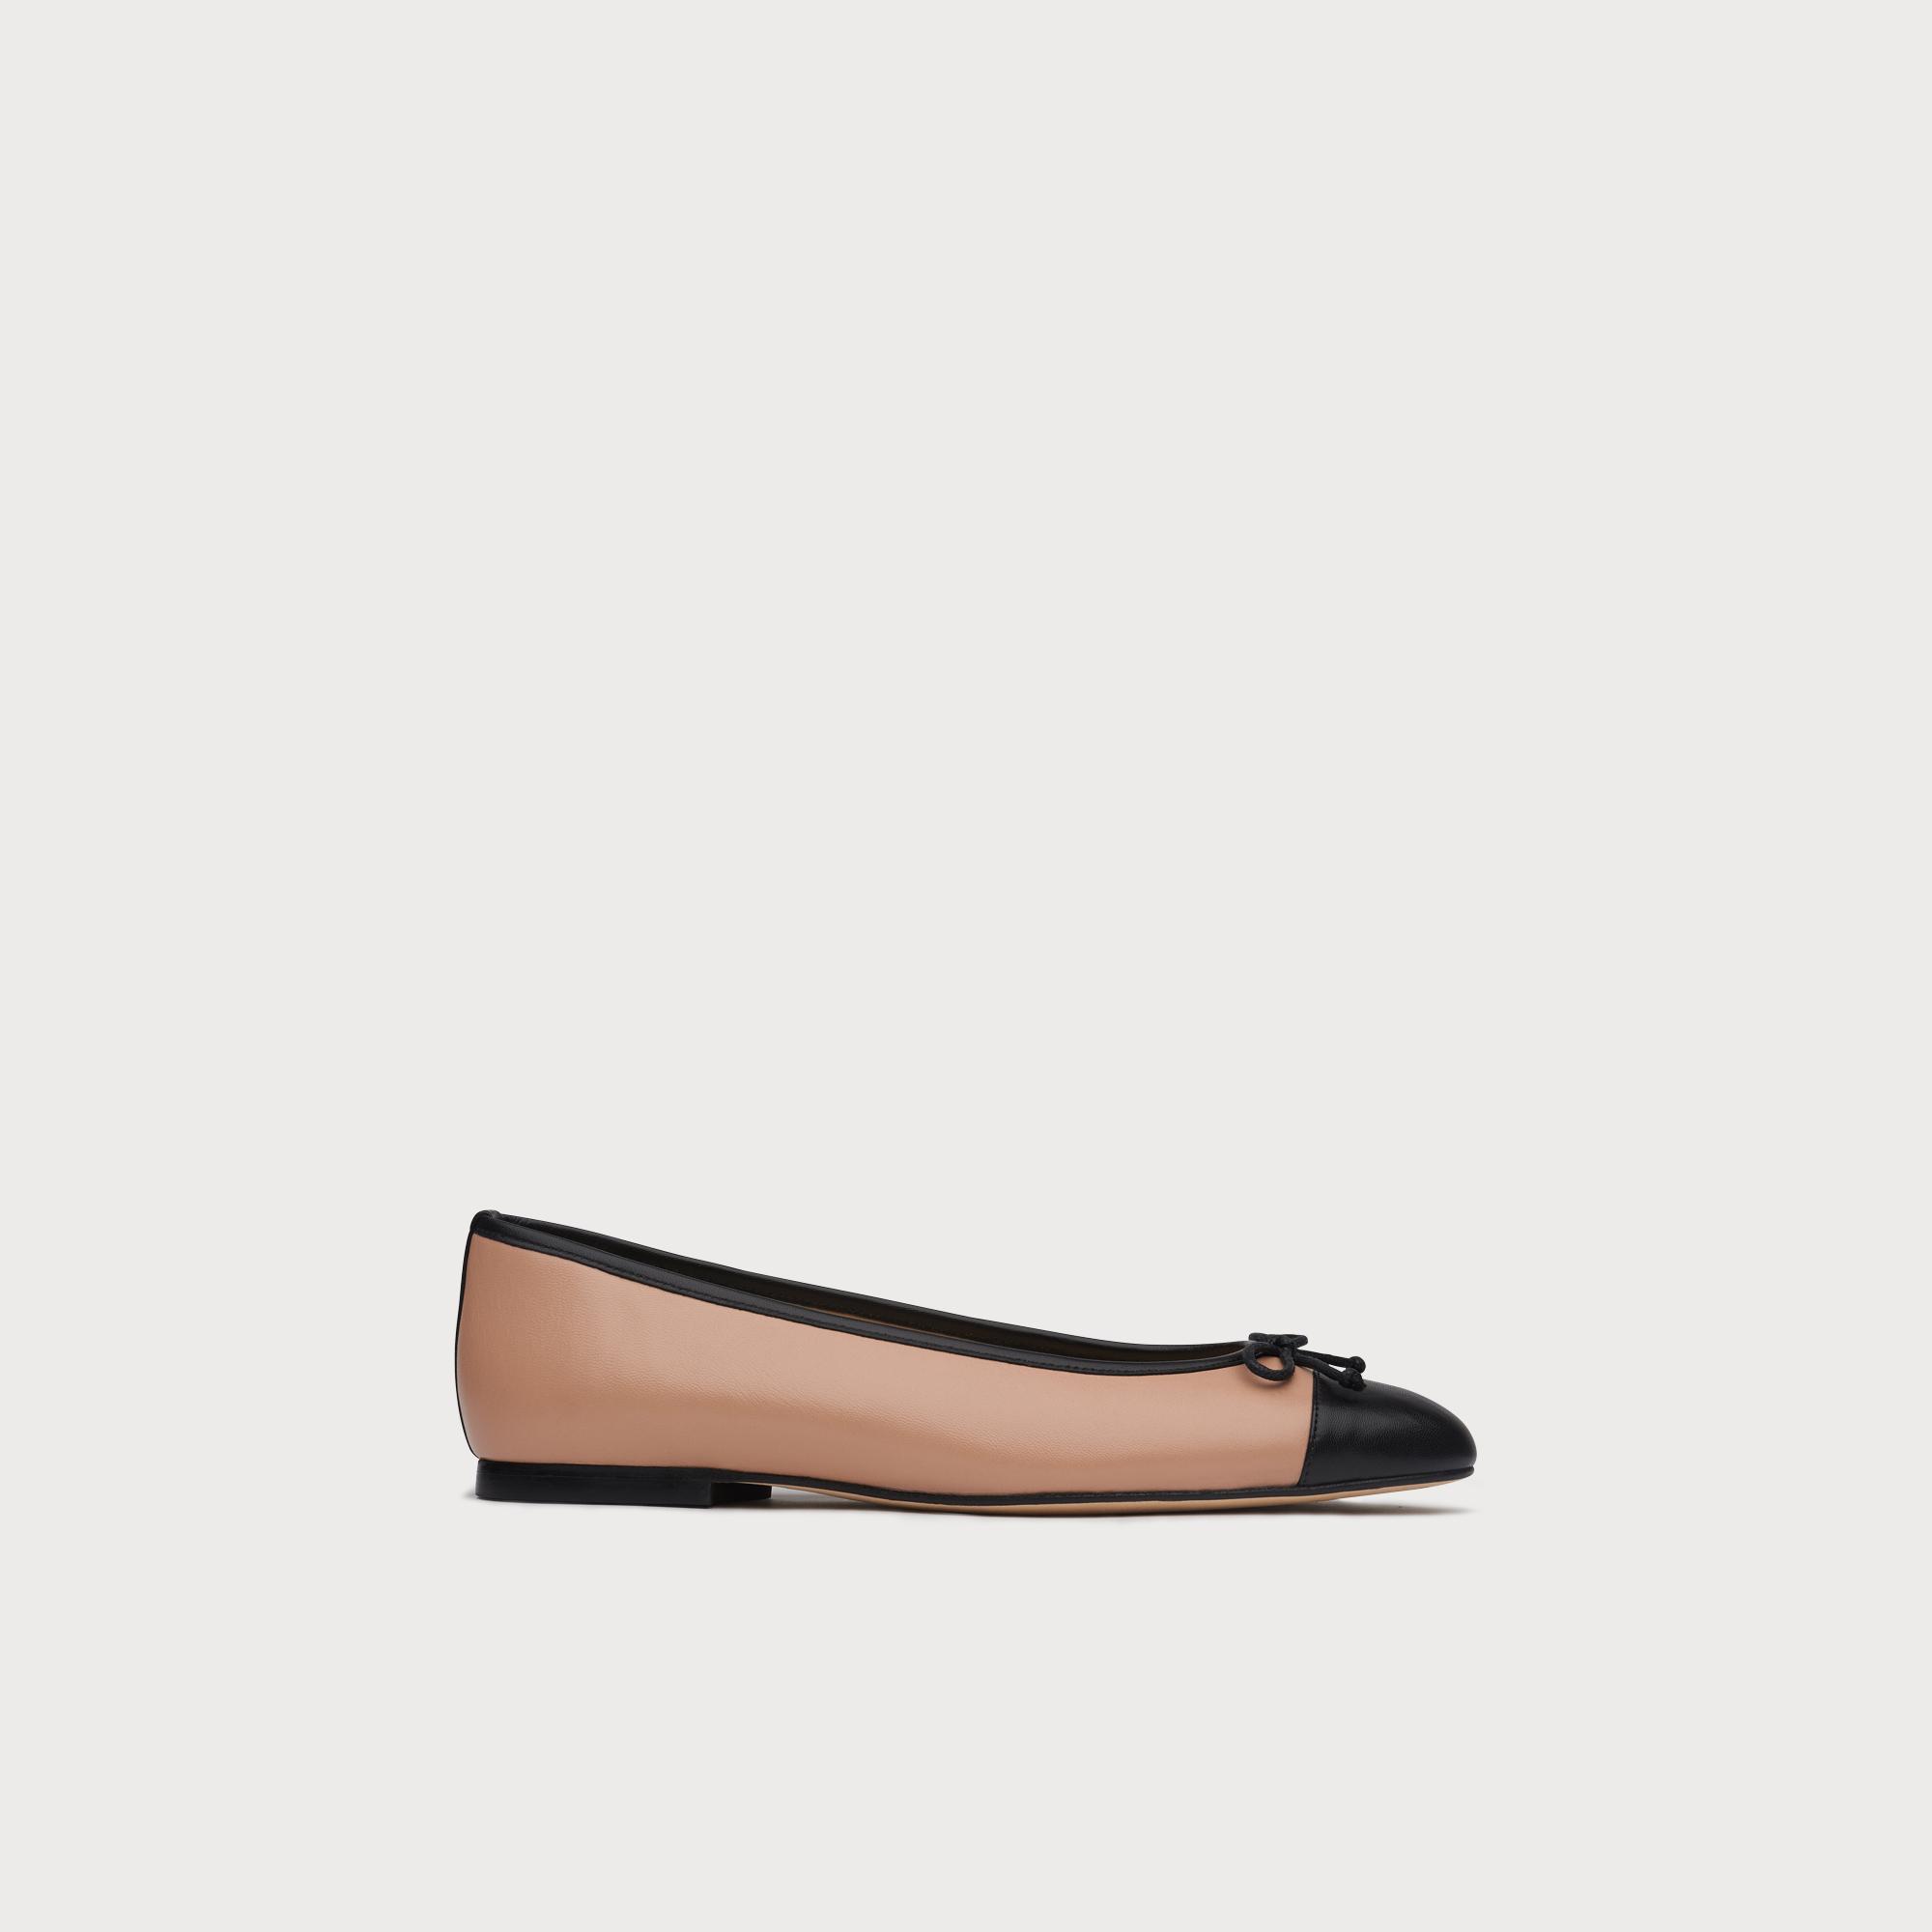 5fe945080 Kara Trench Toe Cap Ballerina Pumps | Shoes | L.K.Bennett